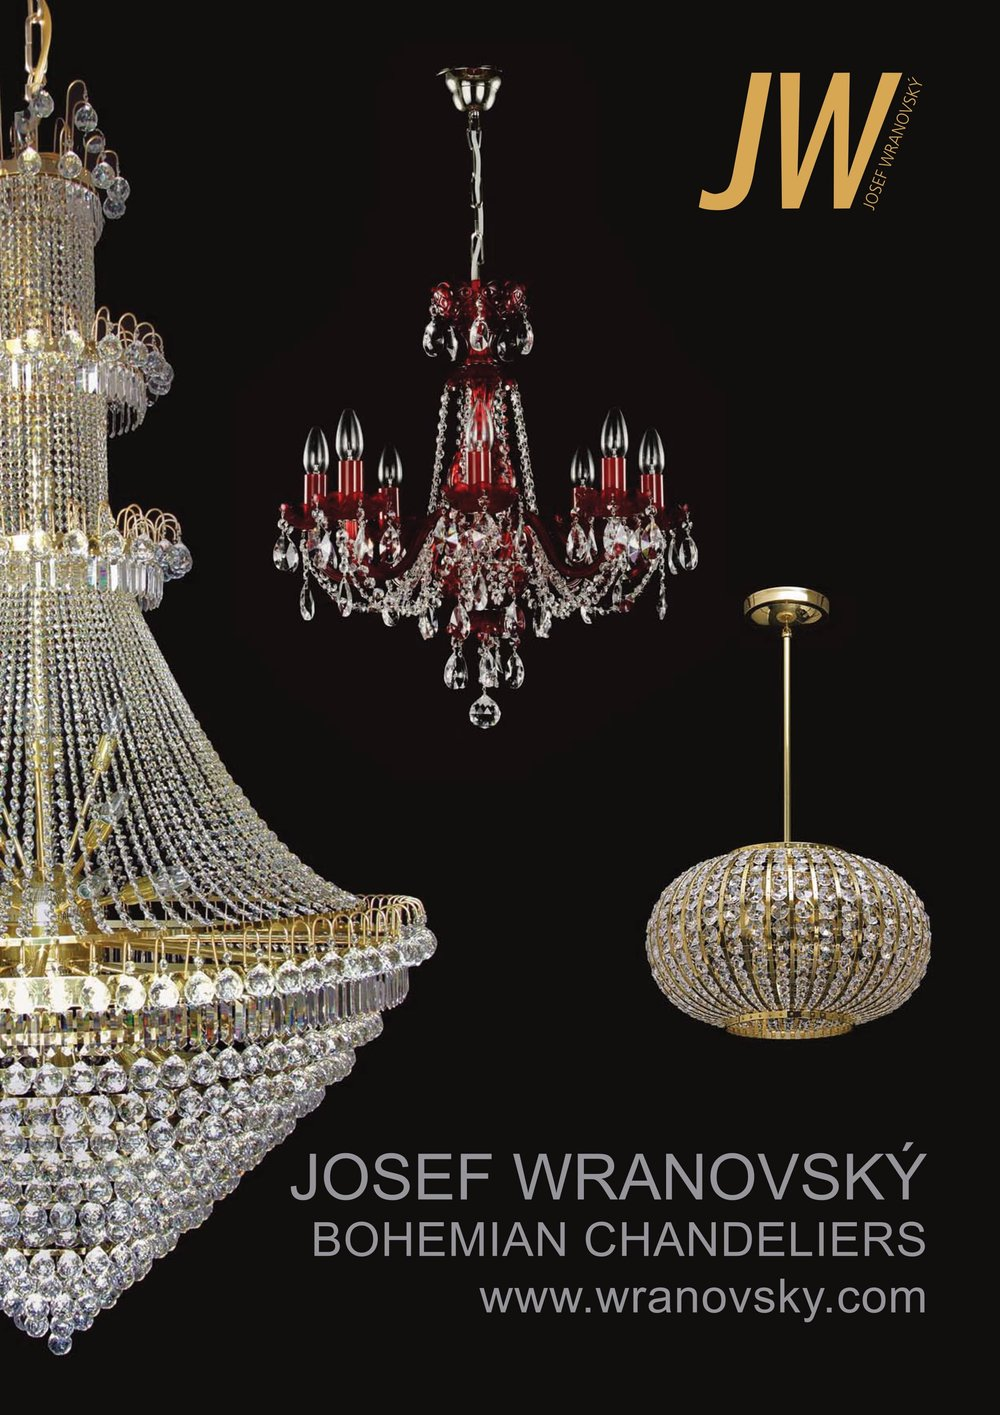 Catalogue2011-Wranovsky.jpg